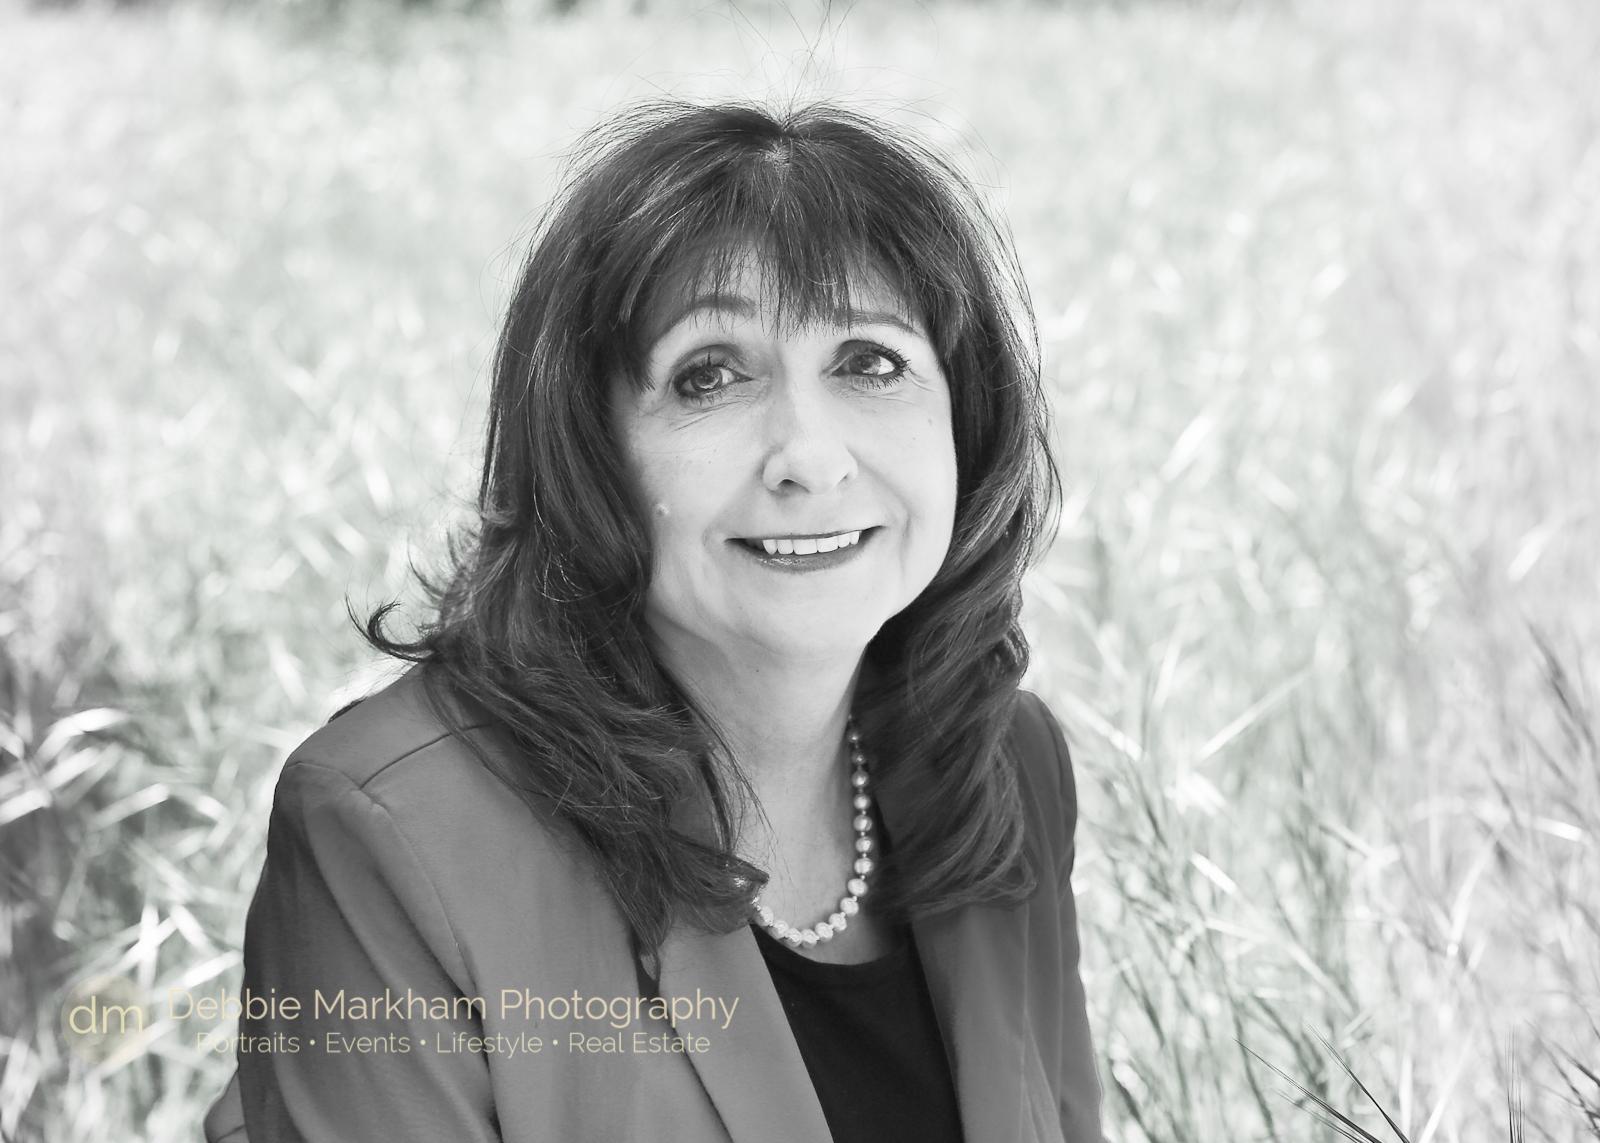 Debbie Markham Photography-Margie Sesser Head Shot-Professional-Cambria-CA-Workplace Photographer-Commercial Photographer-Corporate Photographer-9803